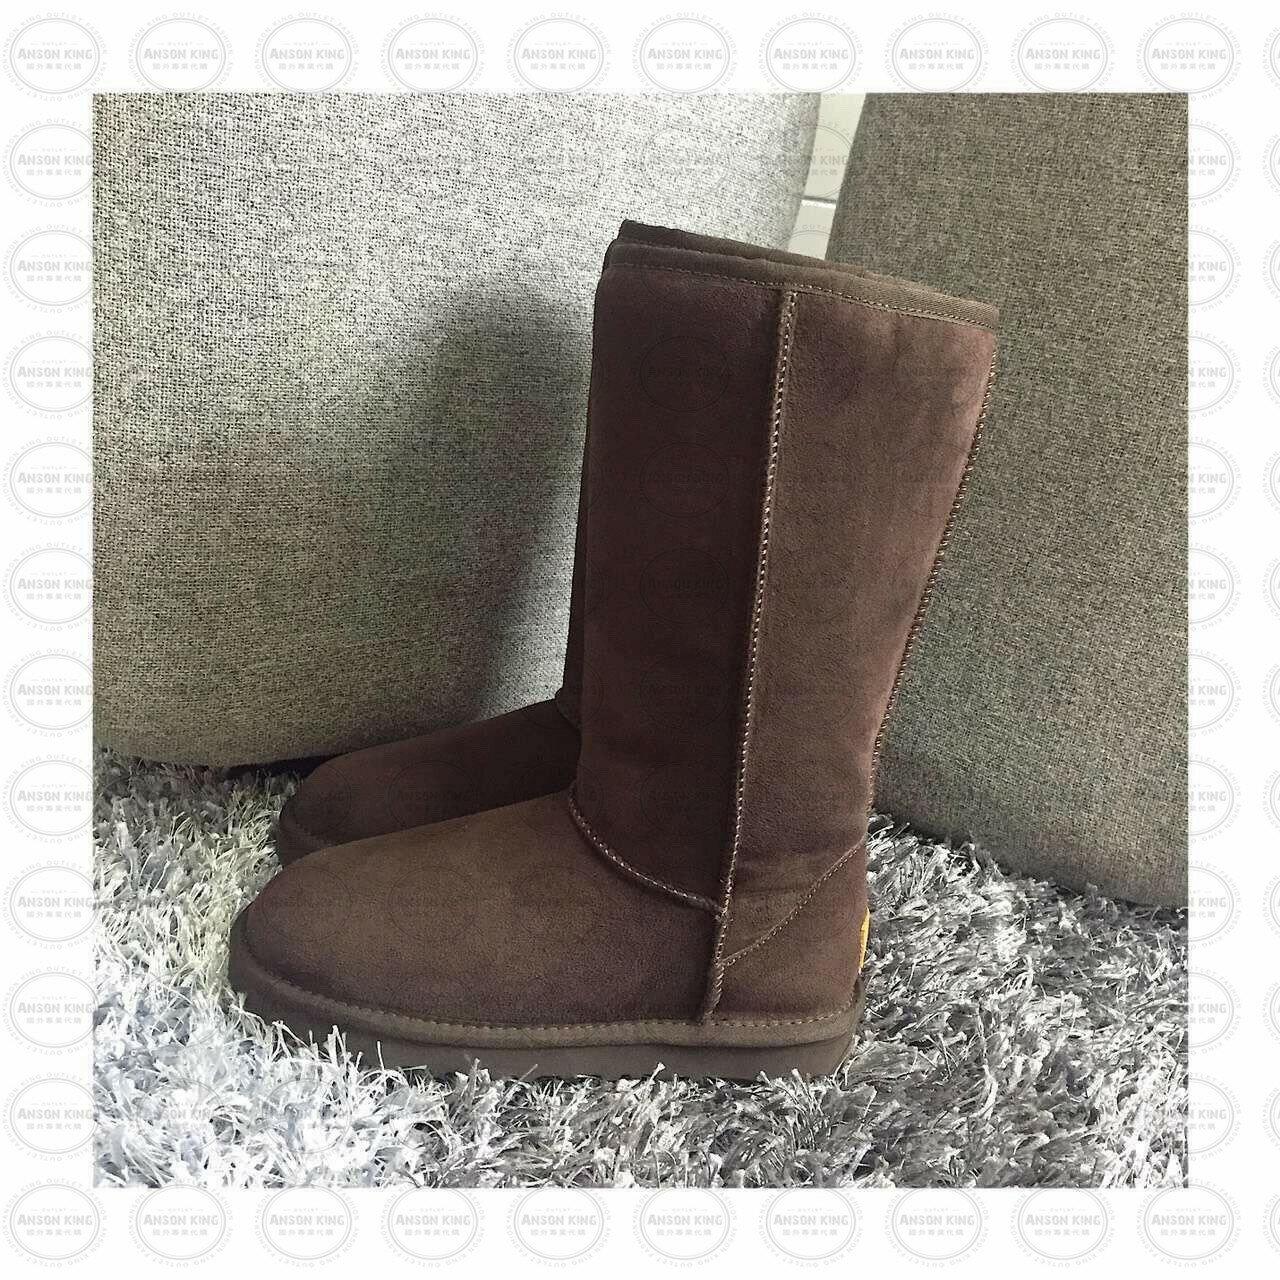 OUTLET正品代購 澳洲 UGG 經典女款羊皮毛一體雪靴 中長靴 保暖 真皮羊皮毛 雪靴 短靴 巧克力色 0